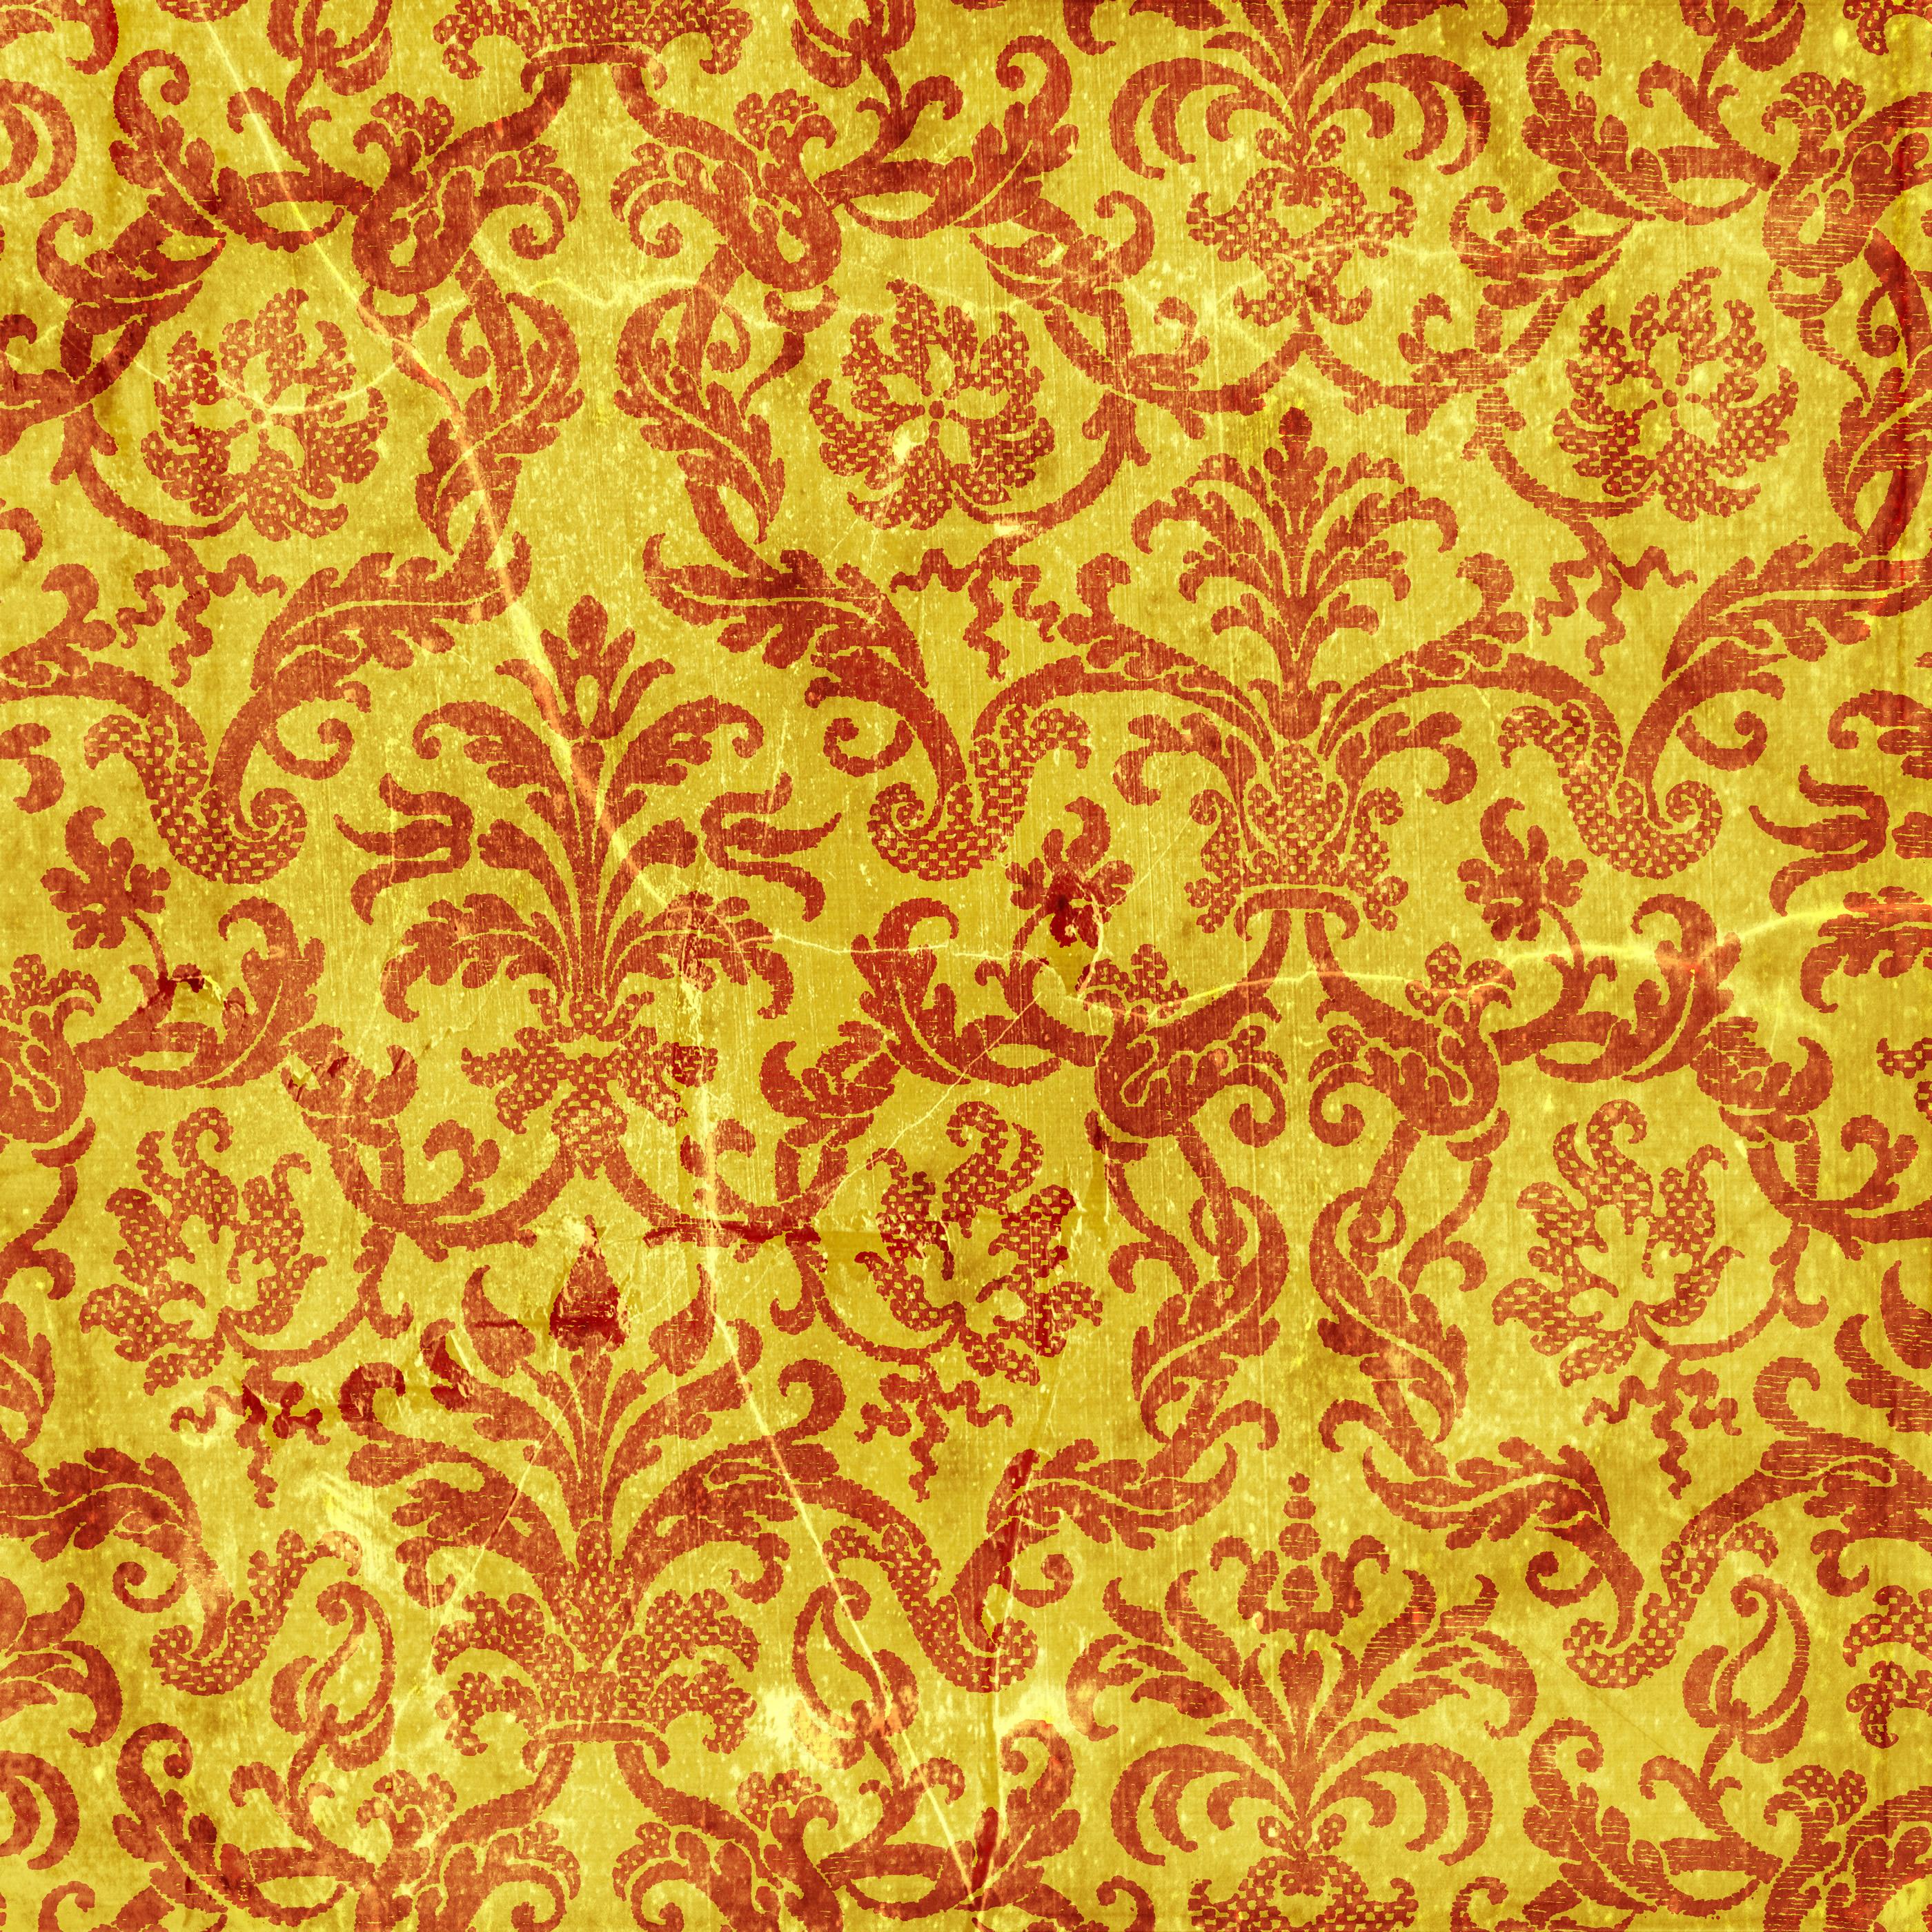 colorfull template, download background, texture, photo, orange, orange pattern background